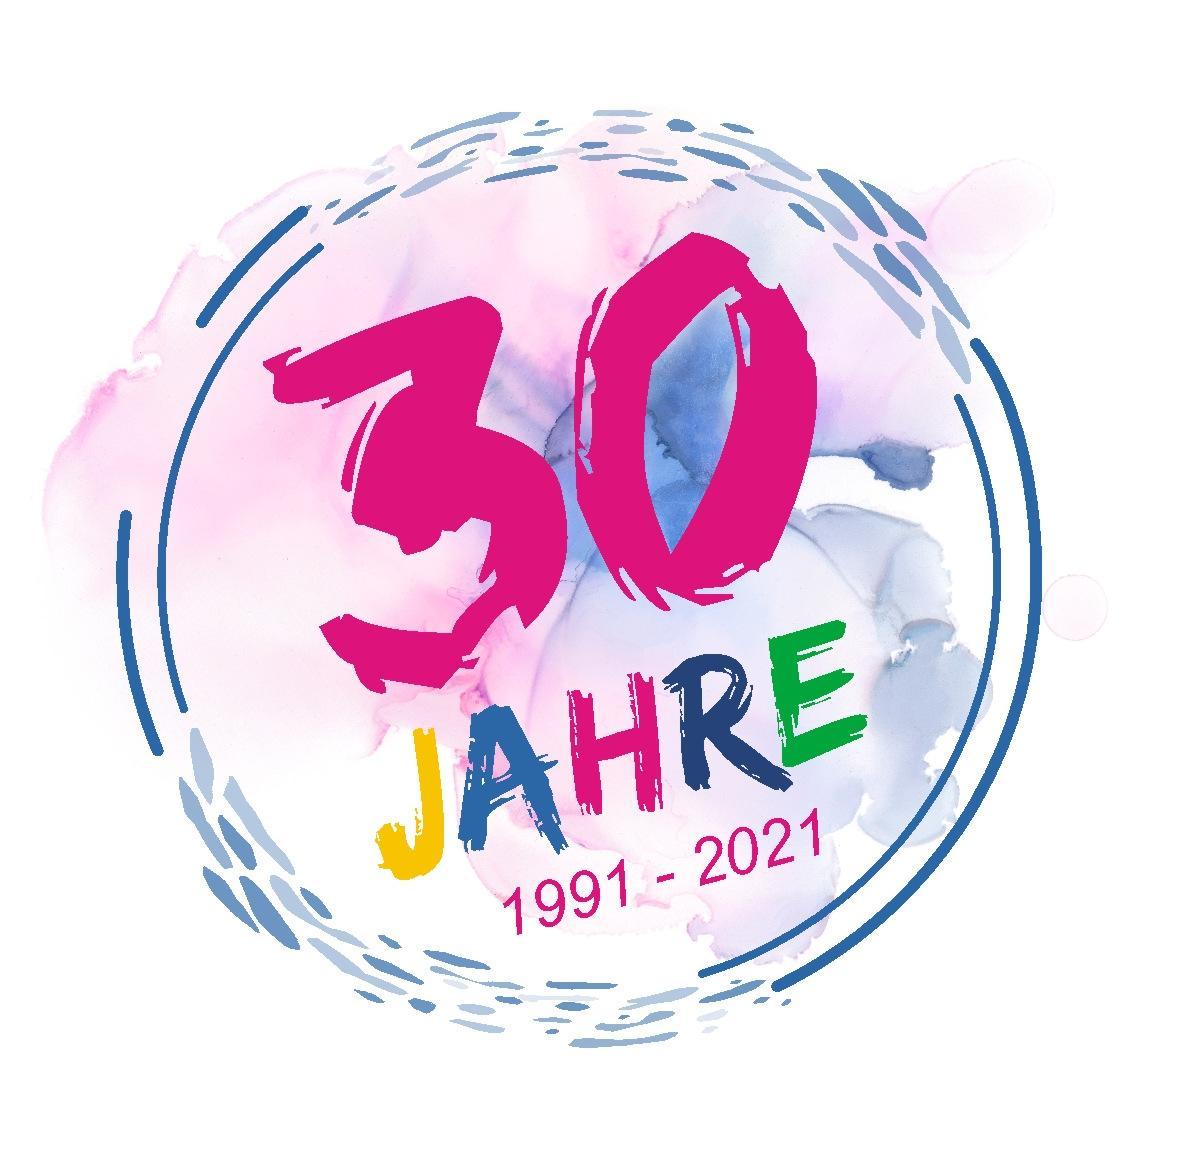 30 Jahre THEPRA